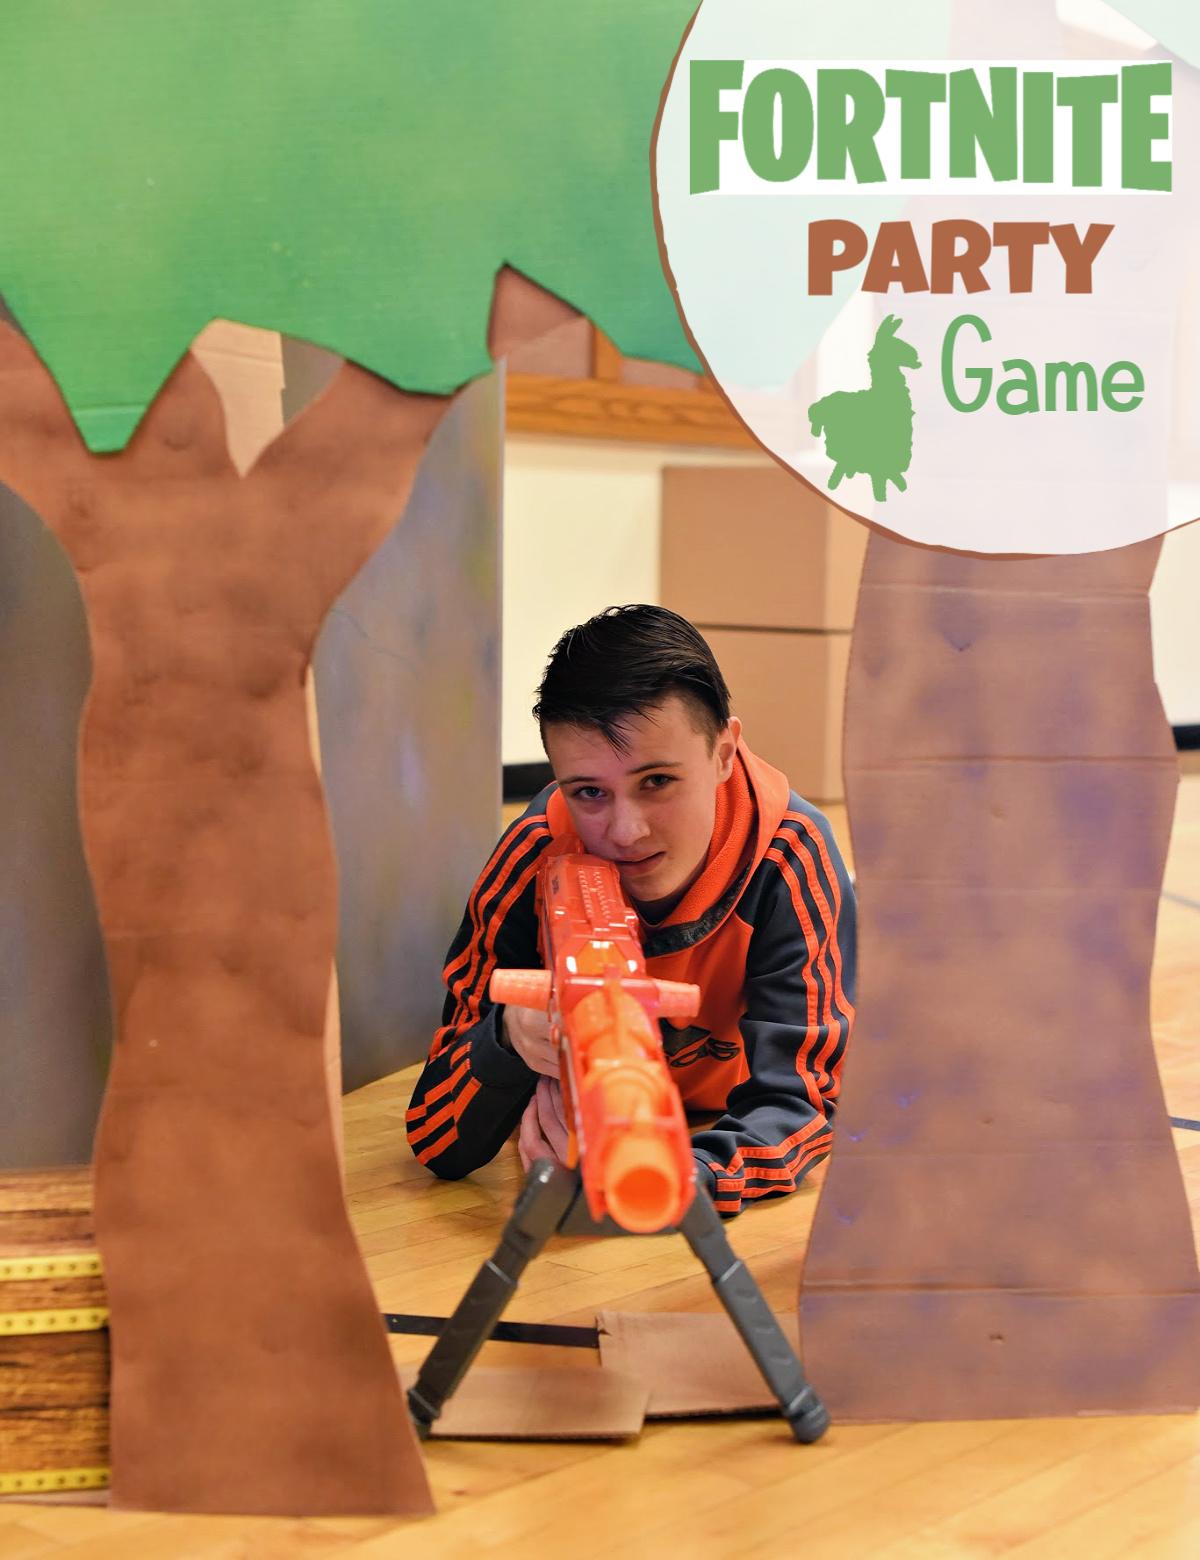 Fun Fortnite Party Games